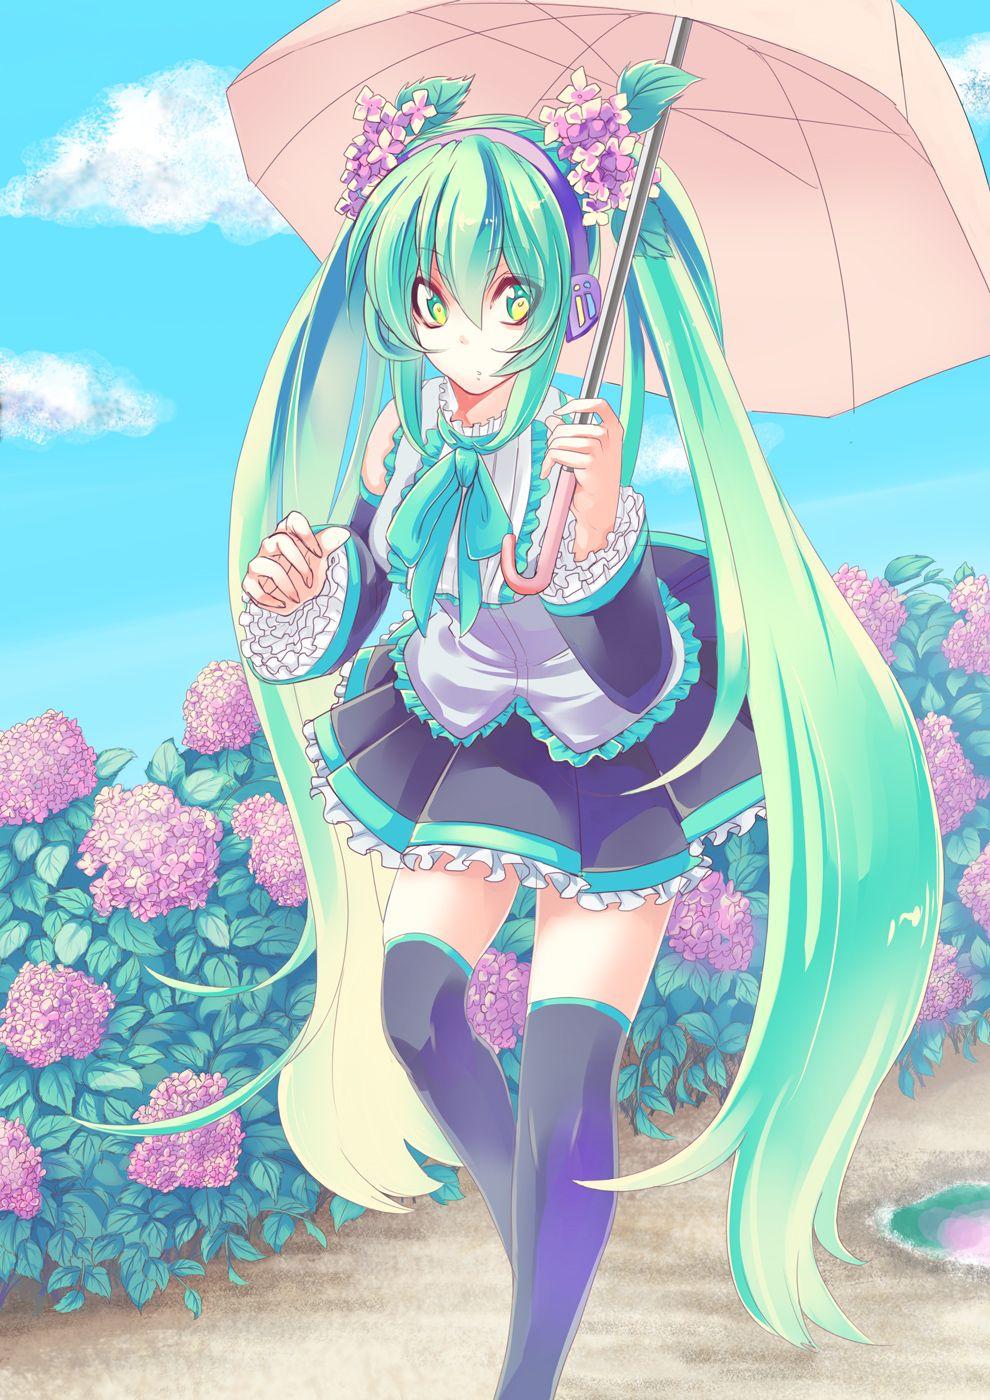 vocaloid anime Vocaloid Daisuki!!! Vocaloid, Anime